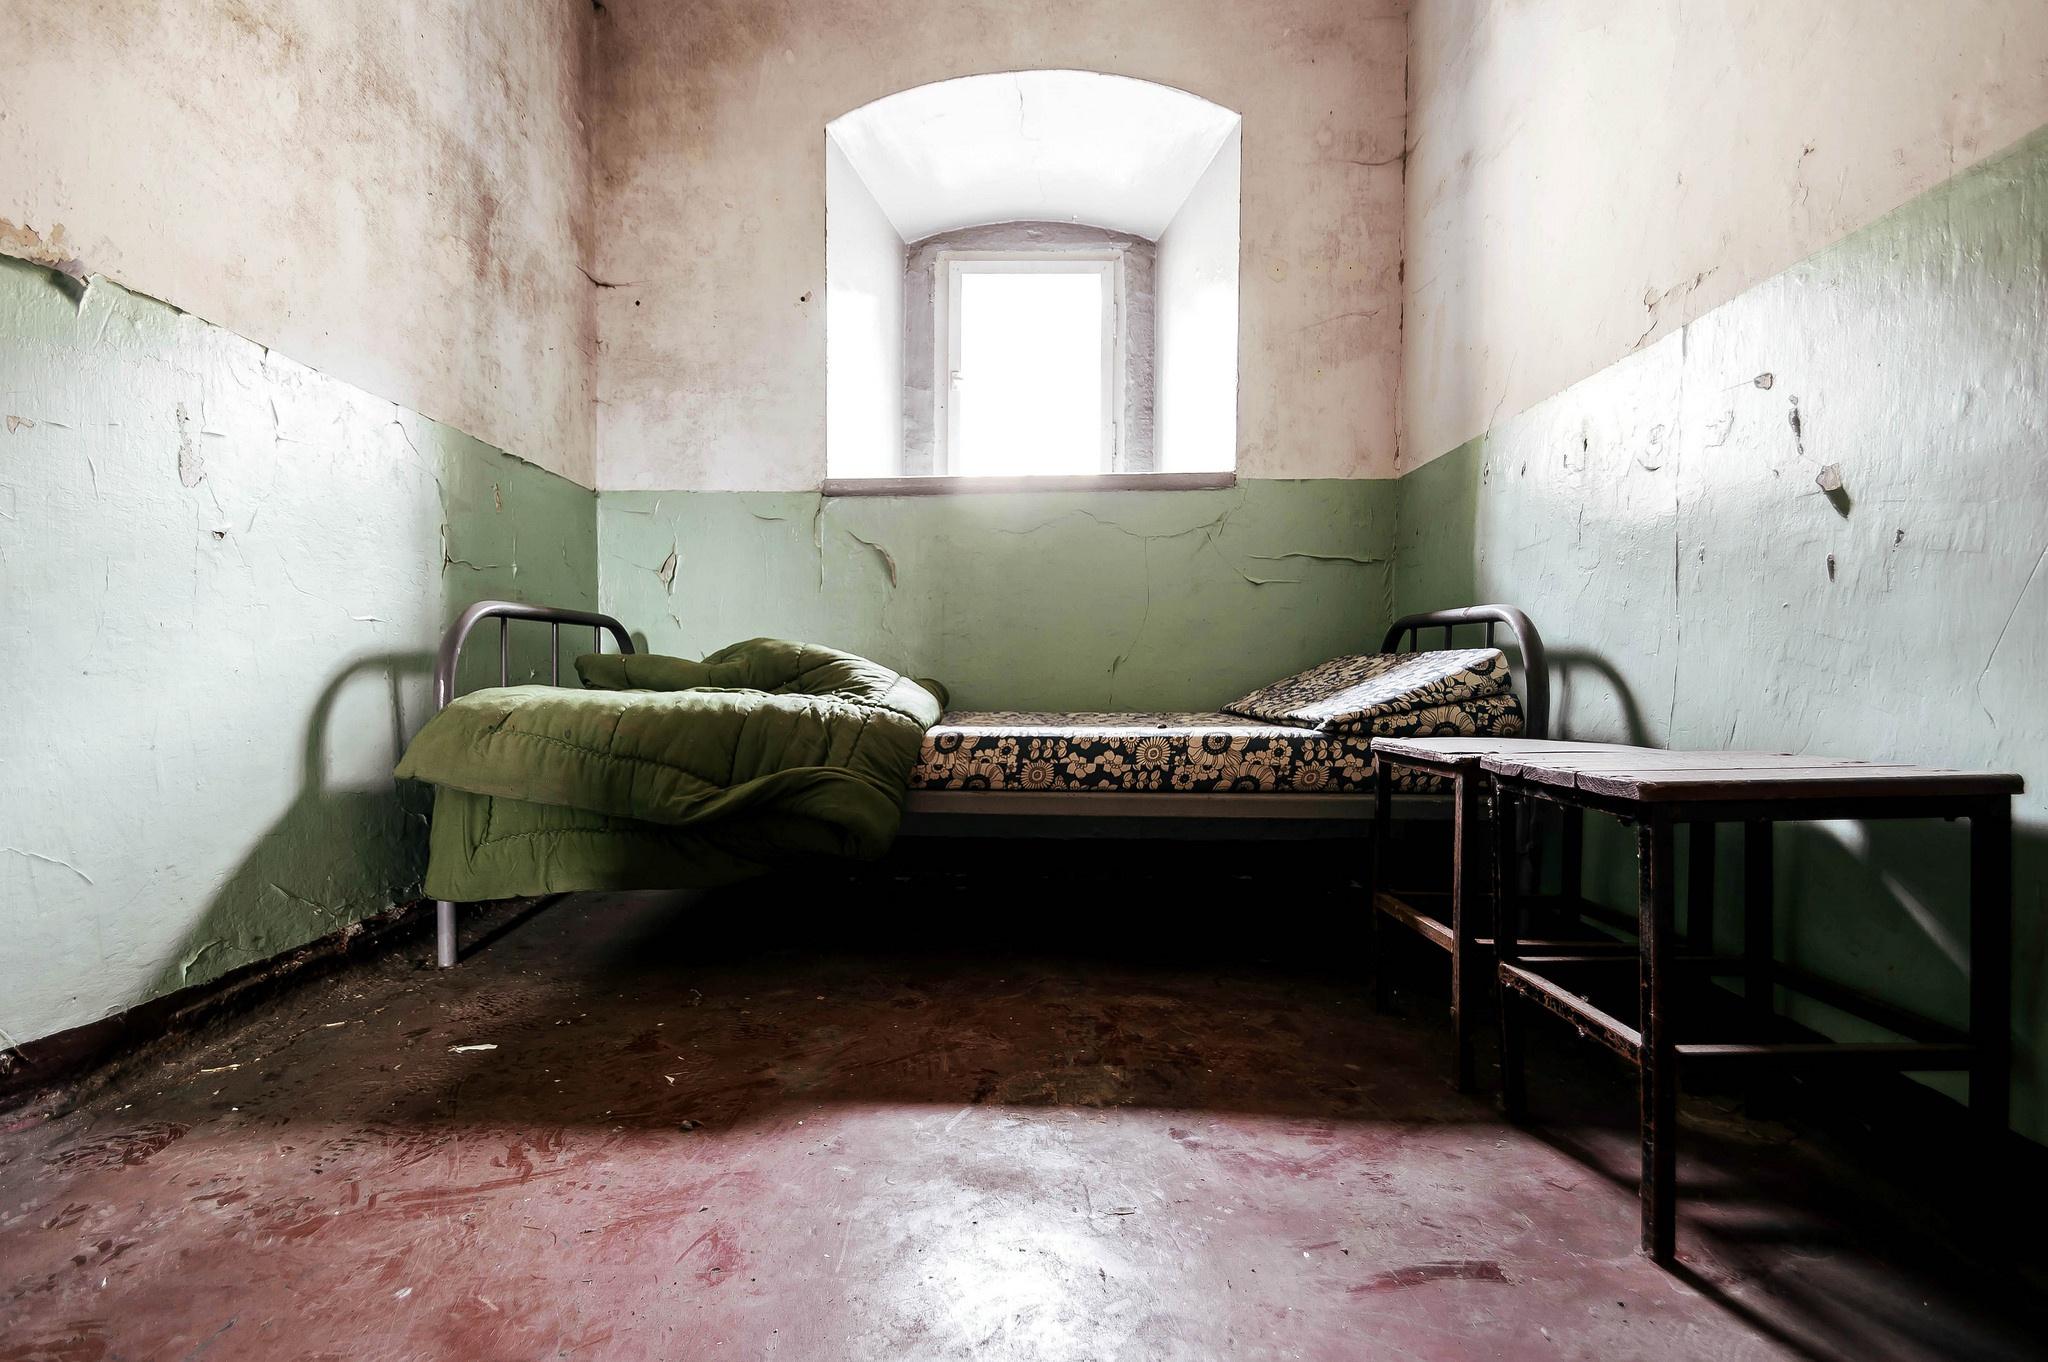 Фото стола в тюремной камере — pic 12